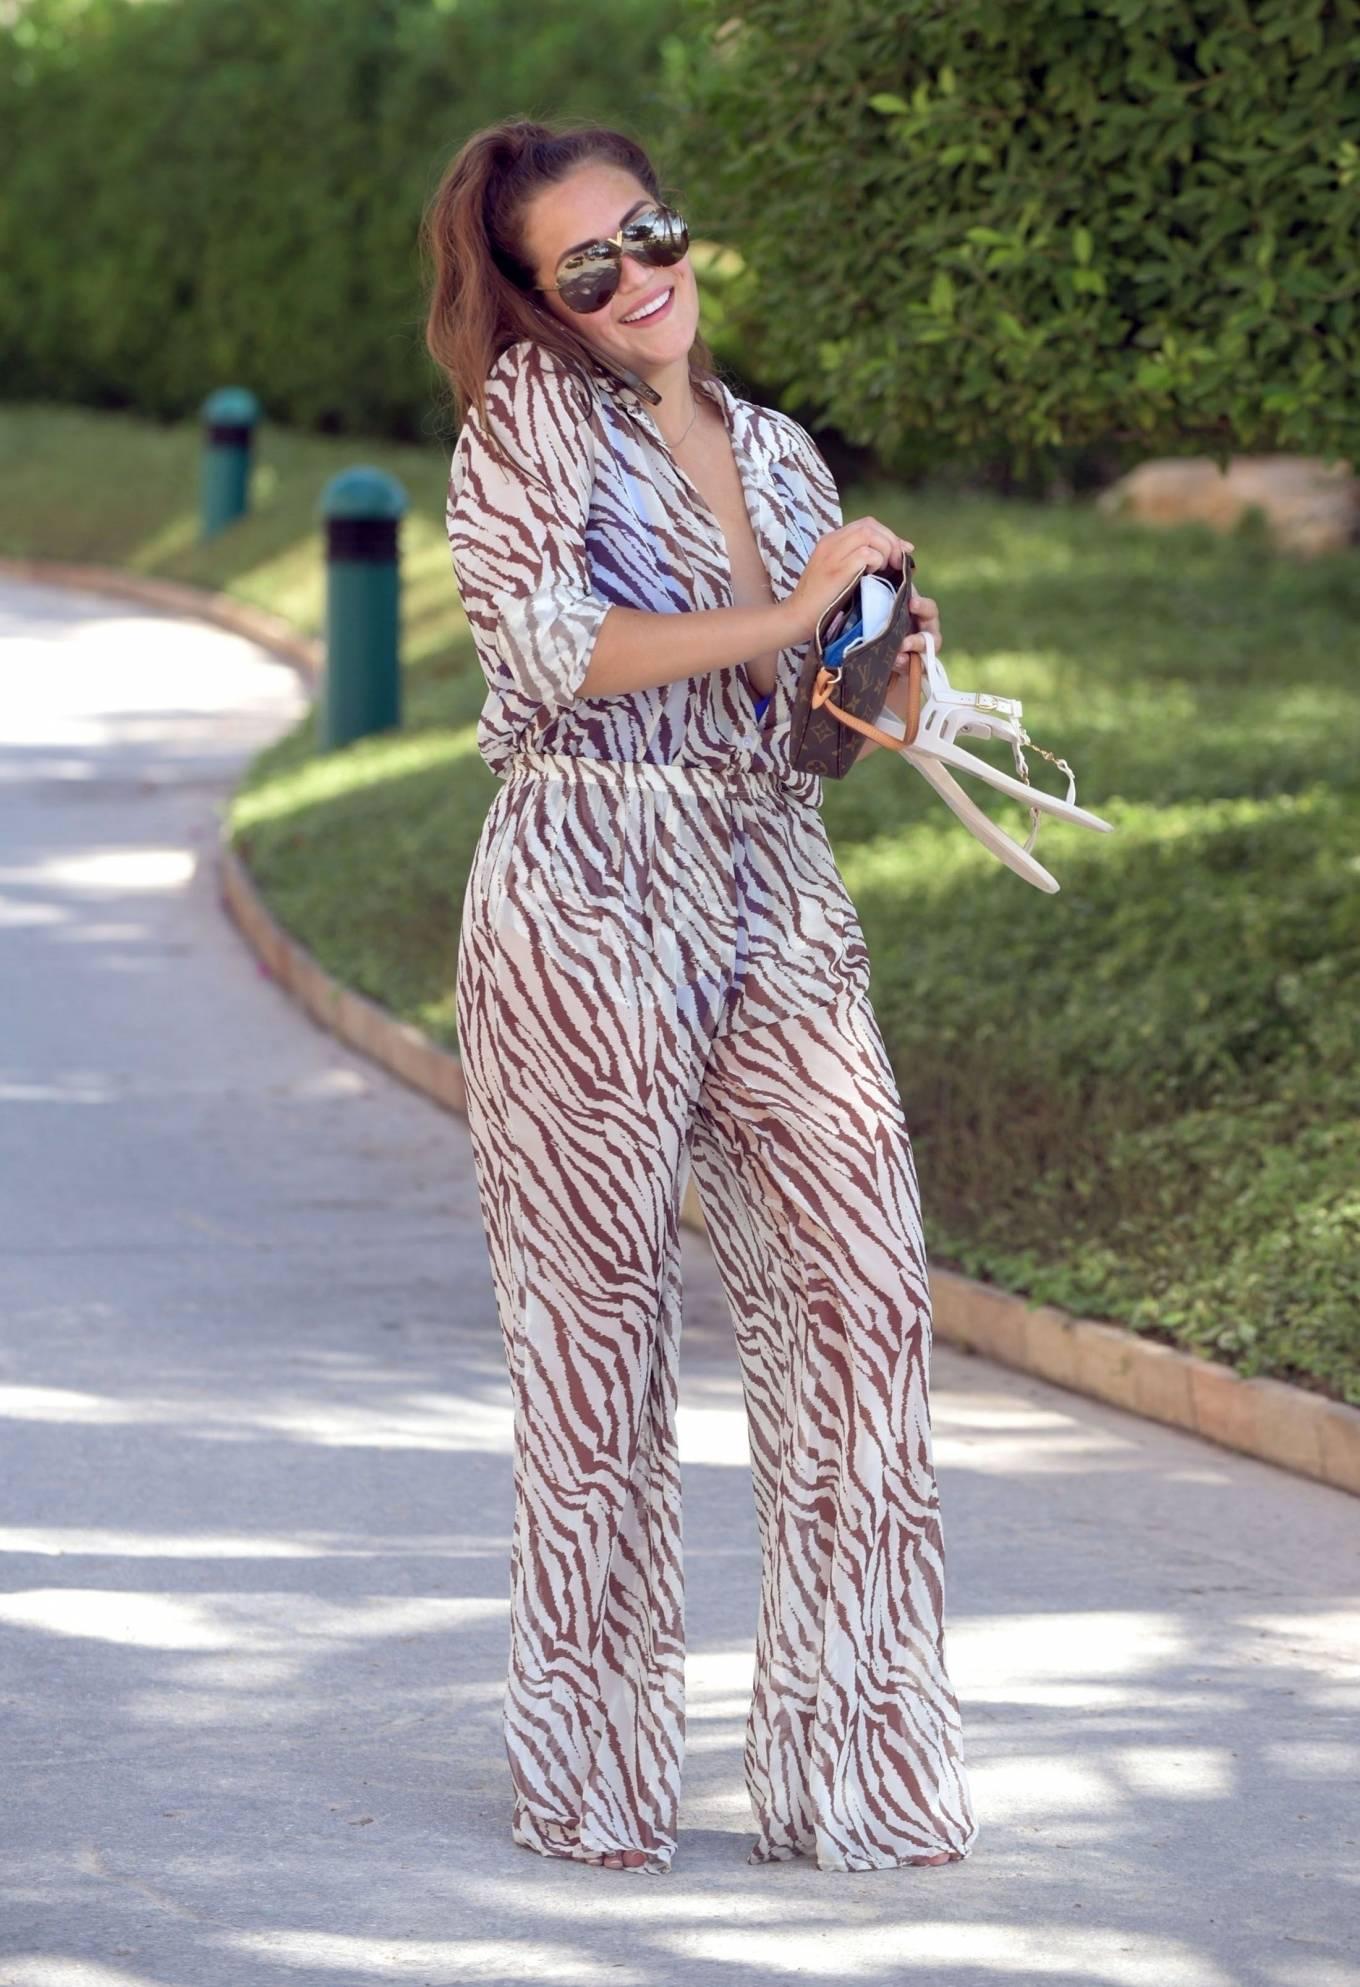 Chloe Goodman 2020 : Chloe Goodman – In a zebra print jumpsuit out on holiday in Dubai-03